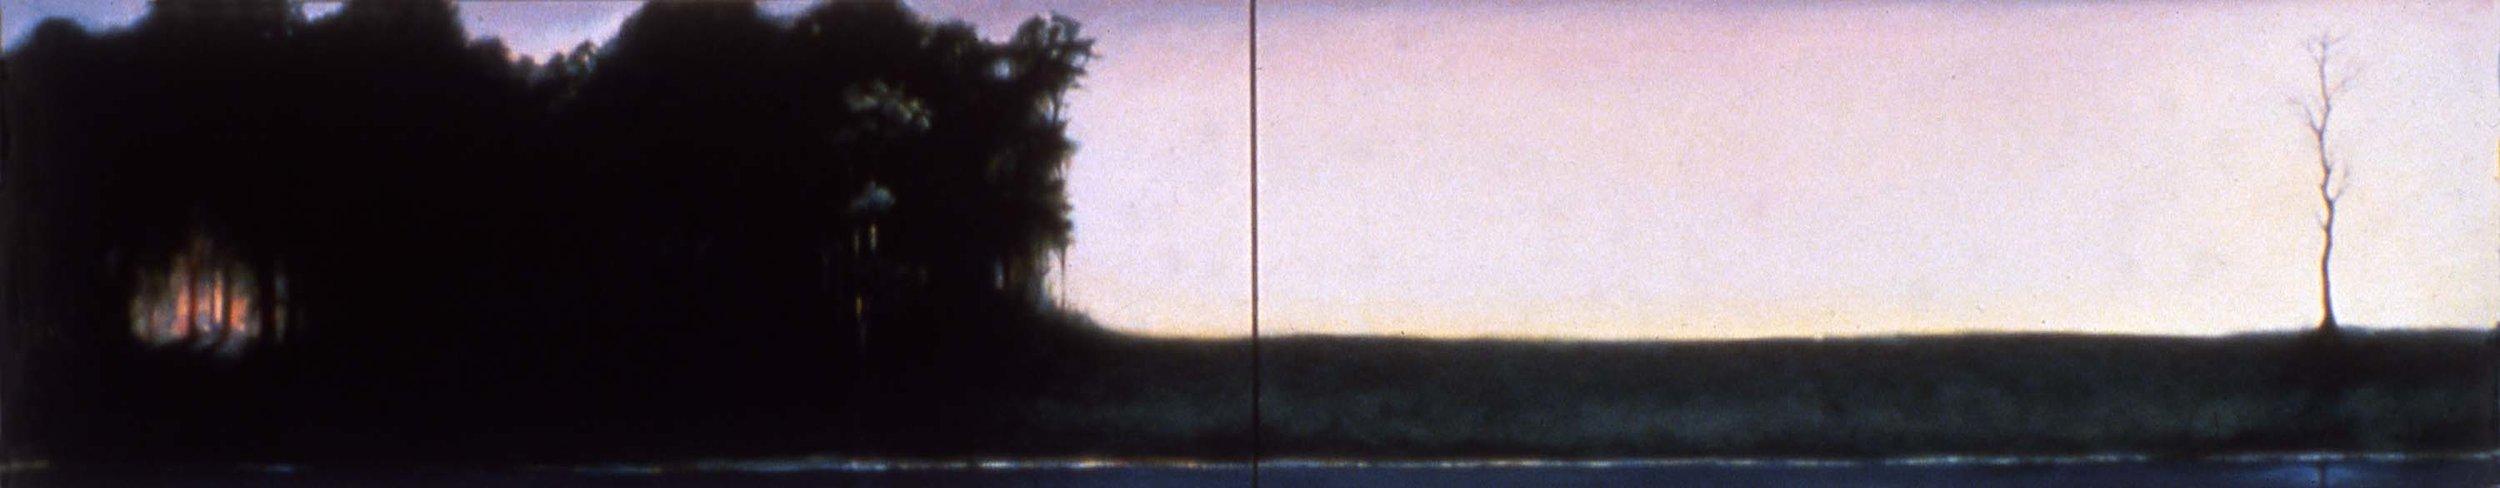 Horizon II/Portrait, 1986